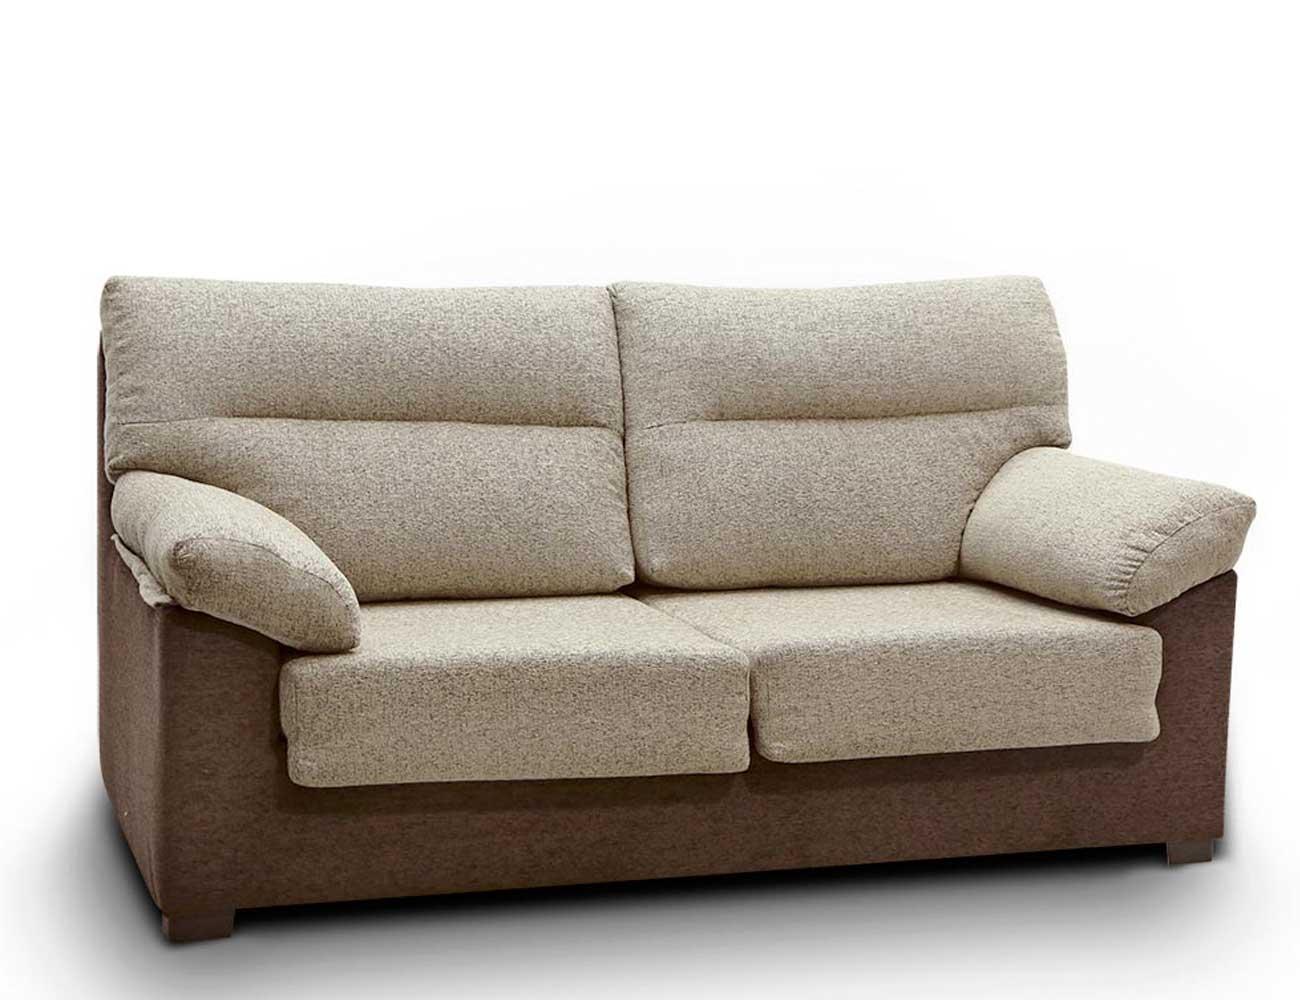 Sofa 3 plazas barato9